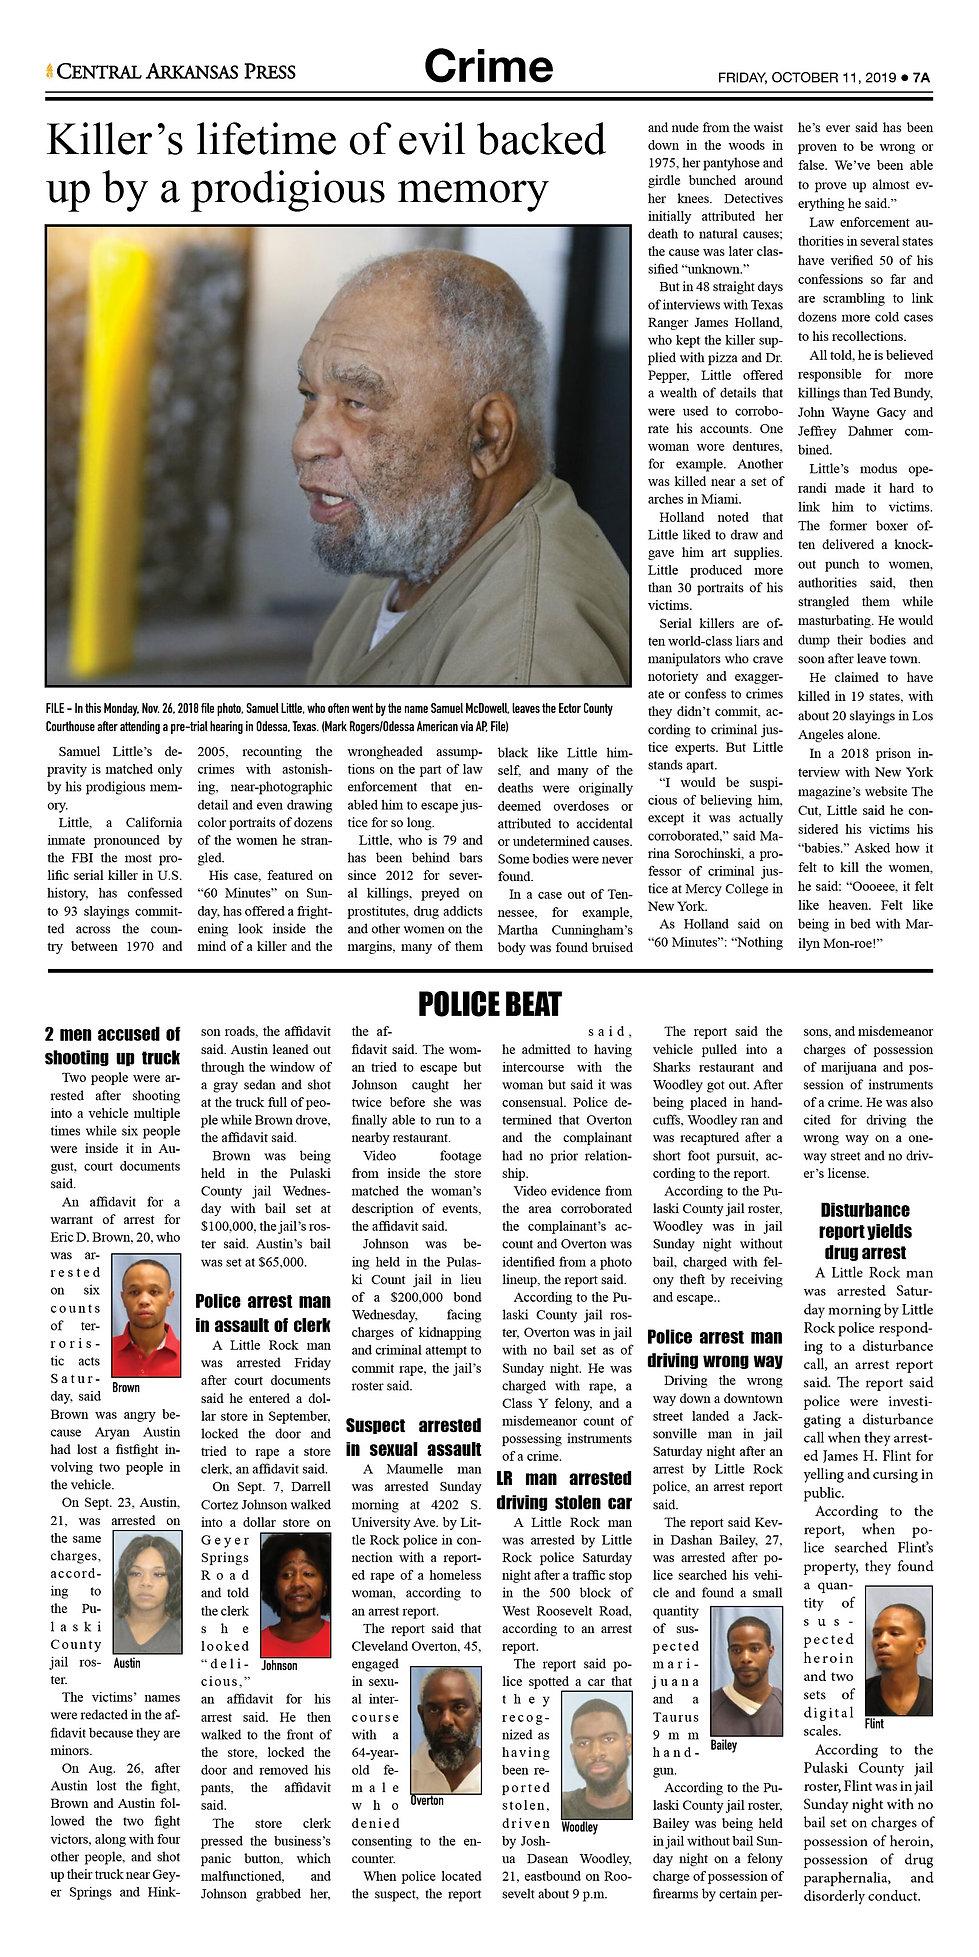 Friday, October 11, 2019; Vo1., Issue 2